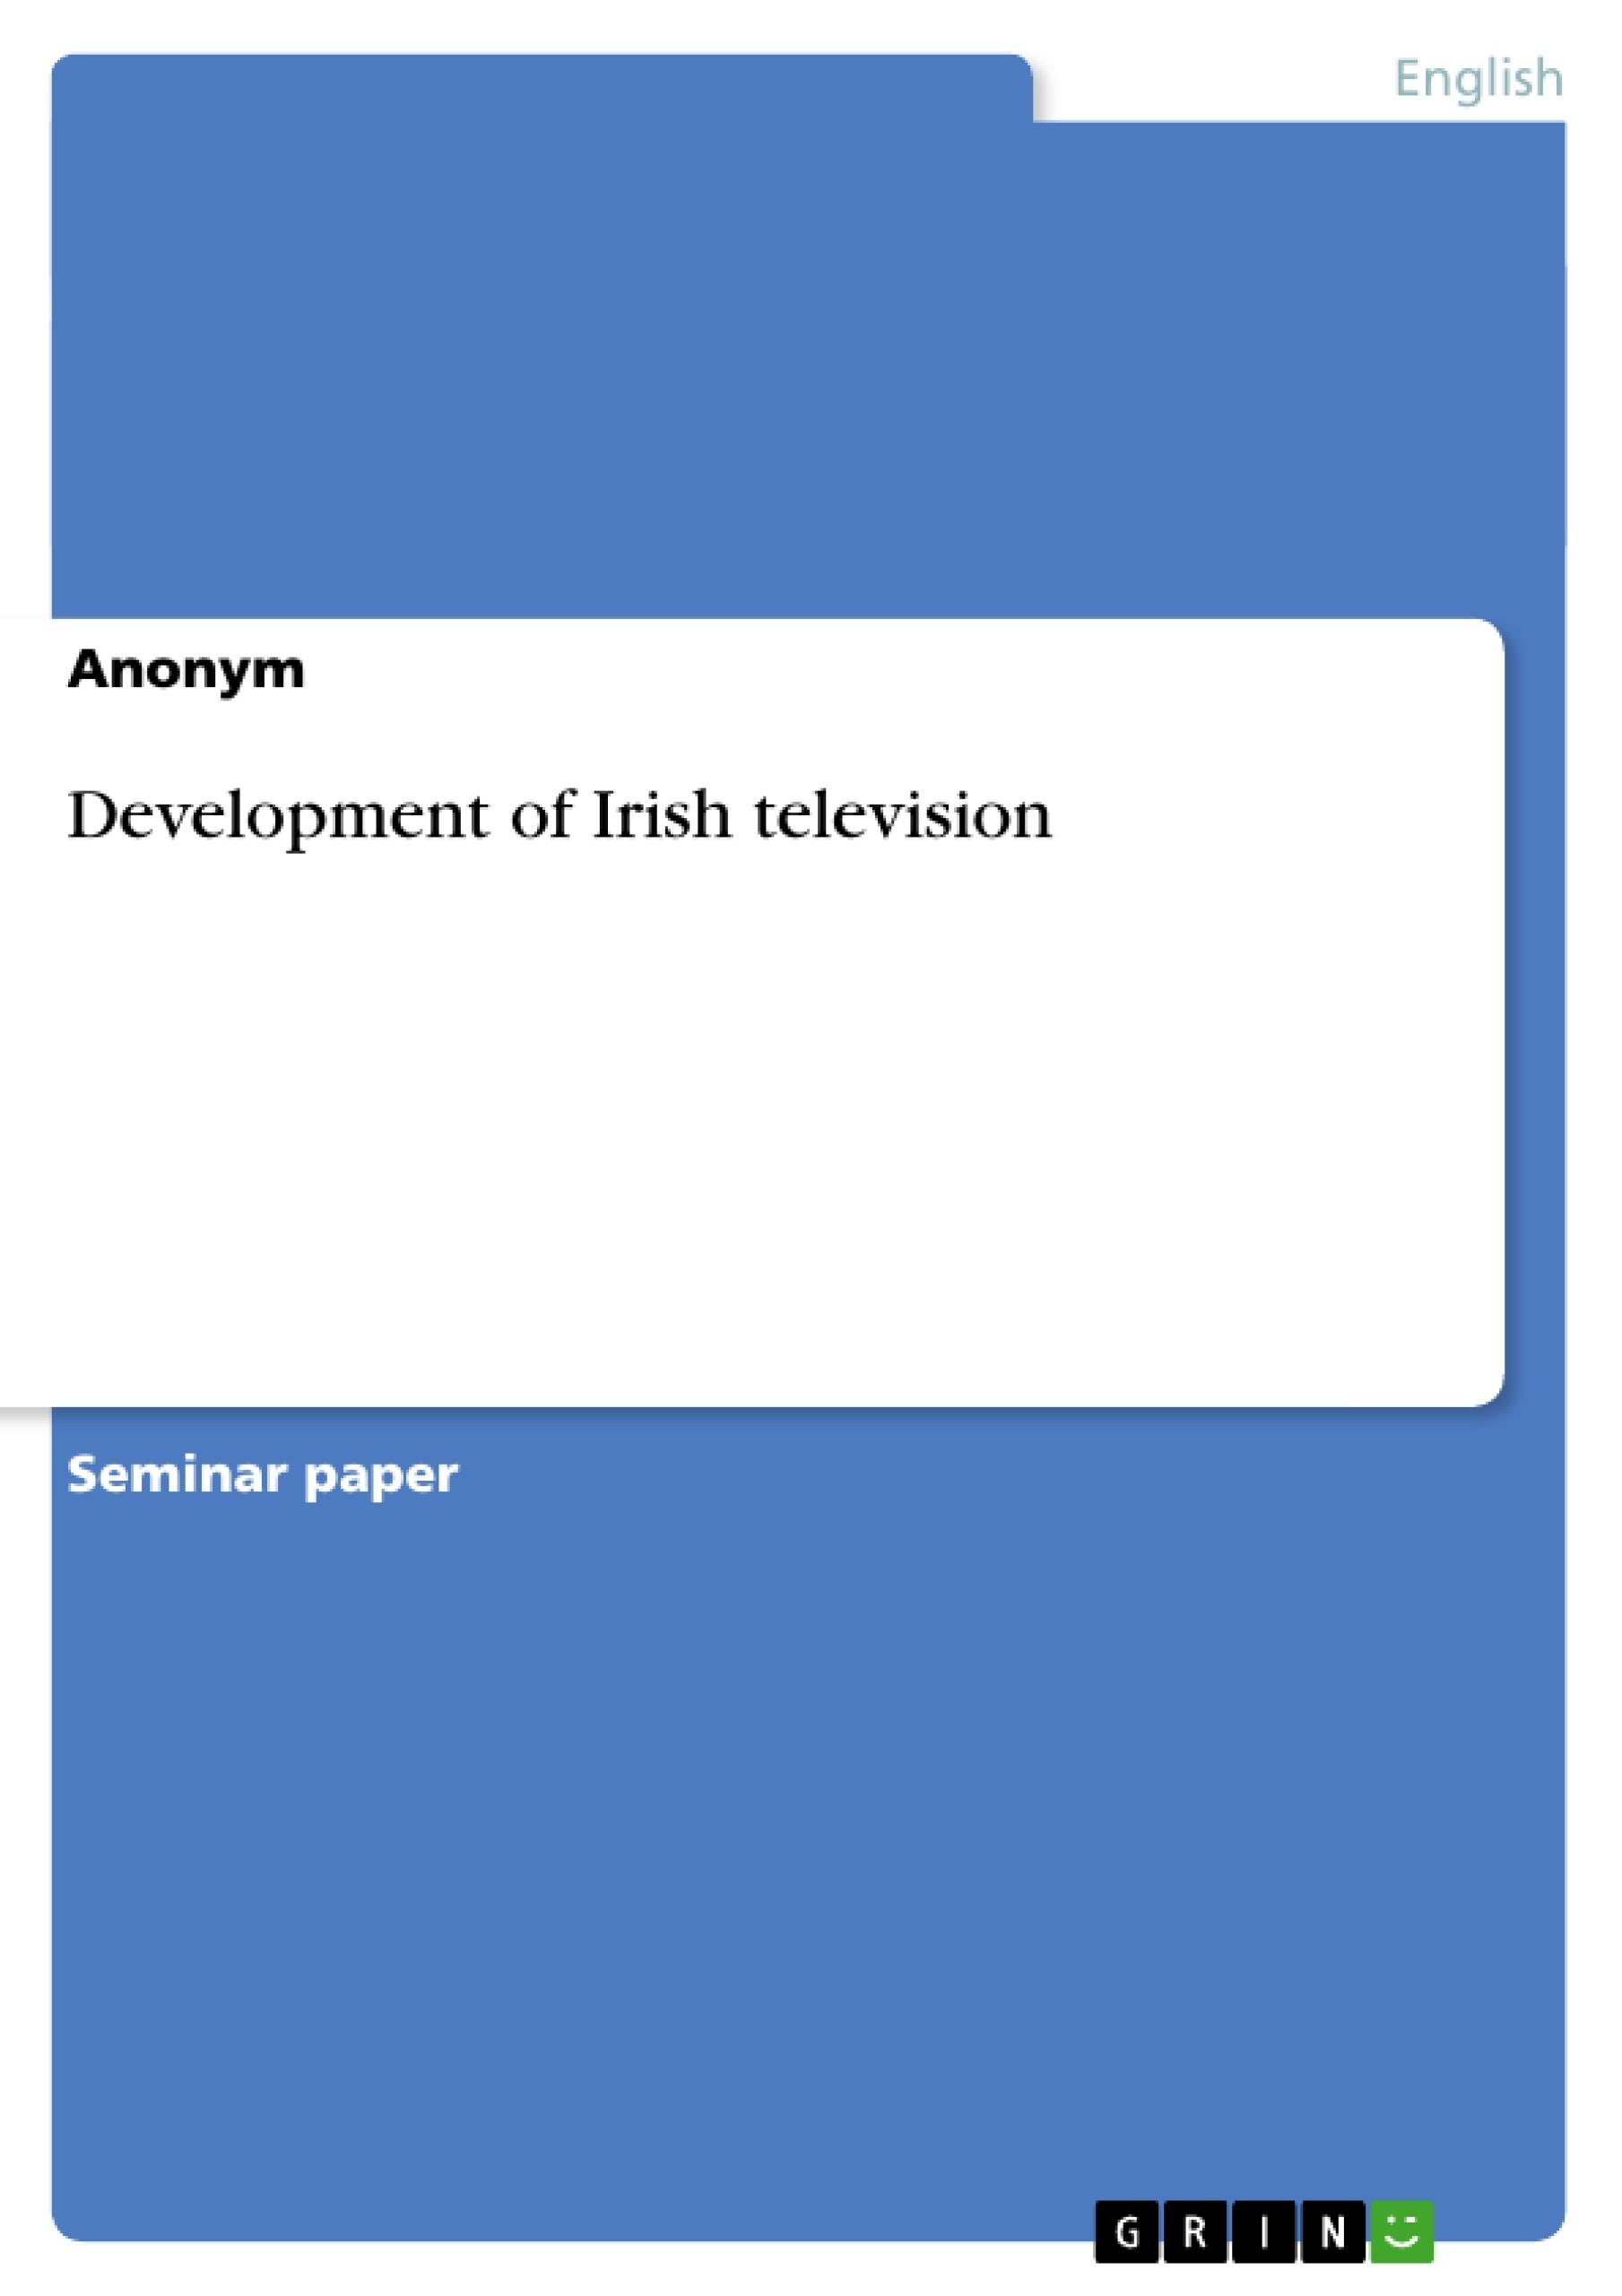 Title: Development of Irish television